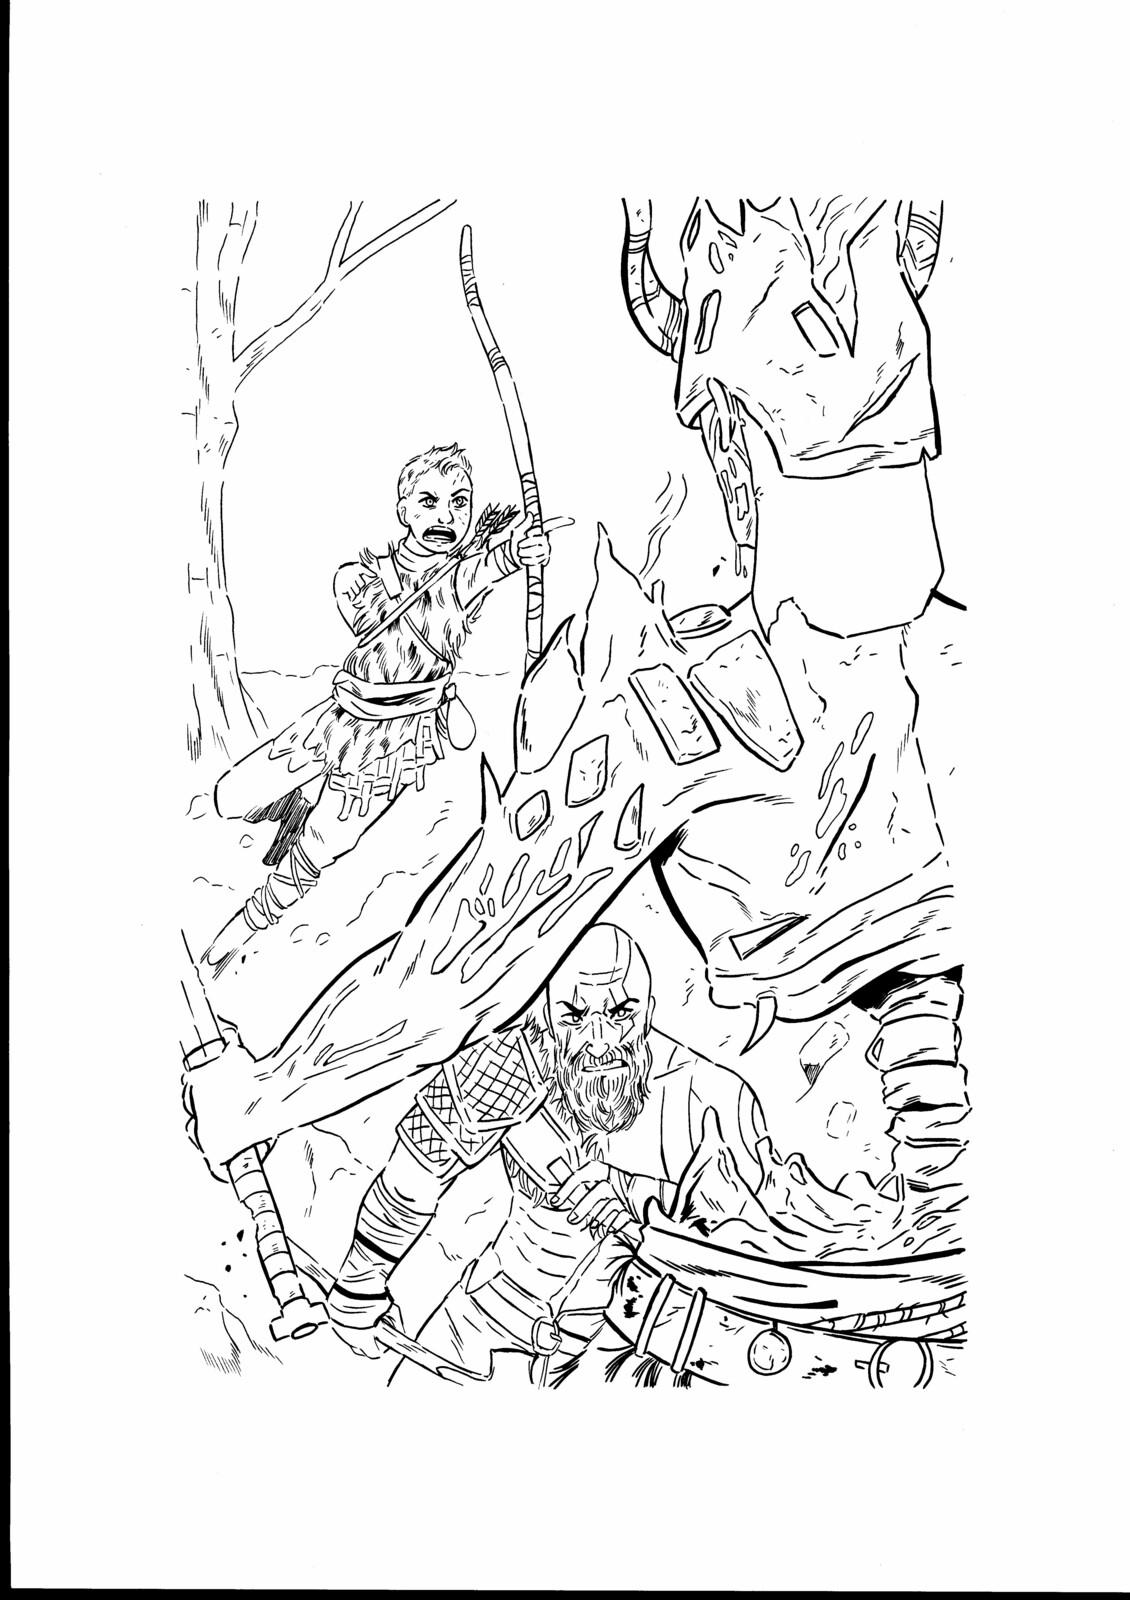 Original Scanned Lineart (Sketch)